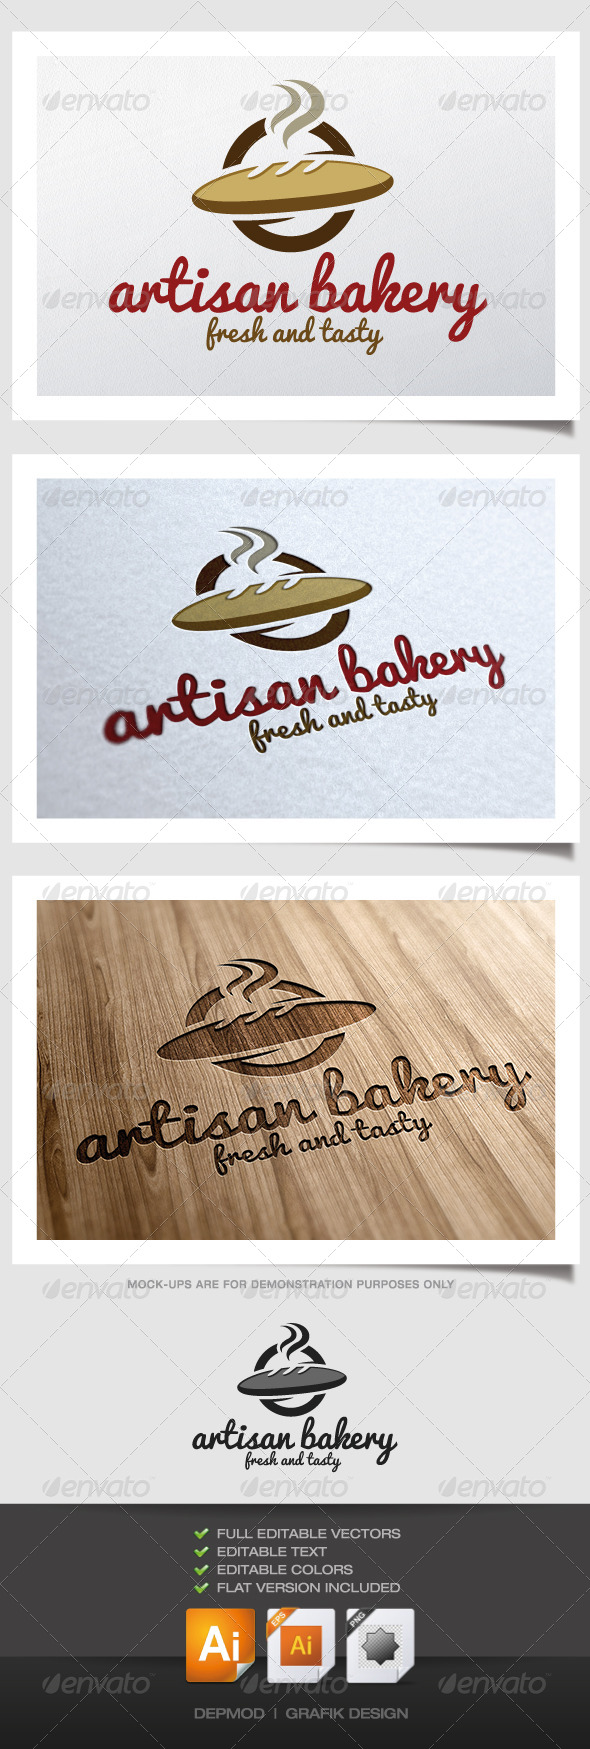 GraphicRiver Artisan Bakery Logo 4779400